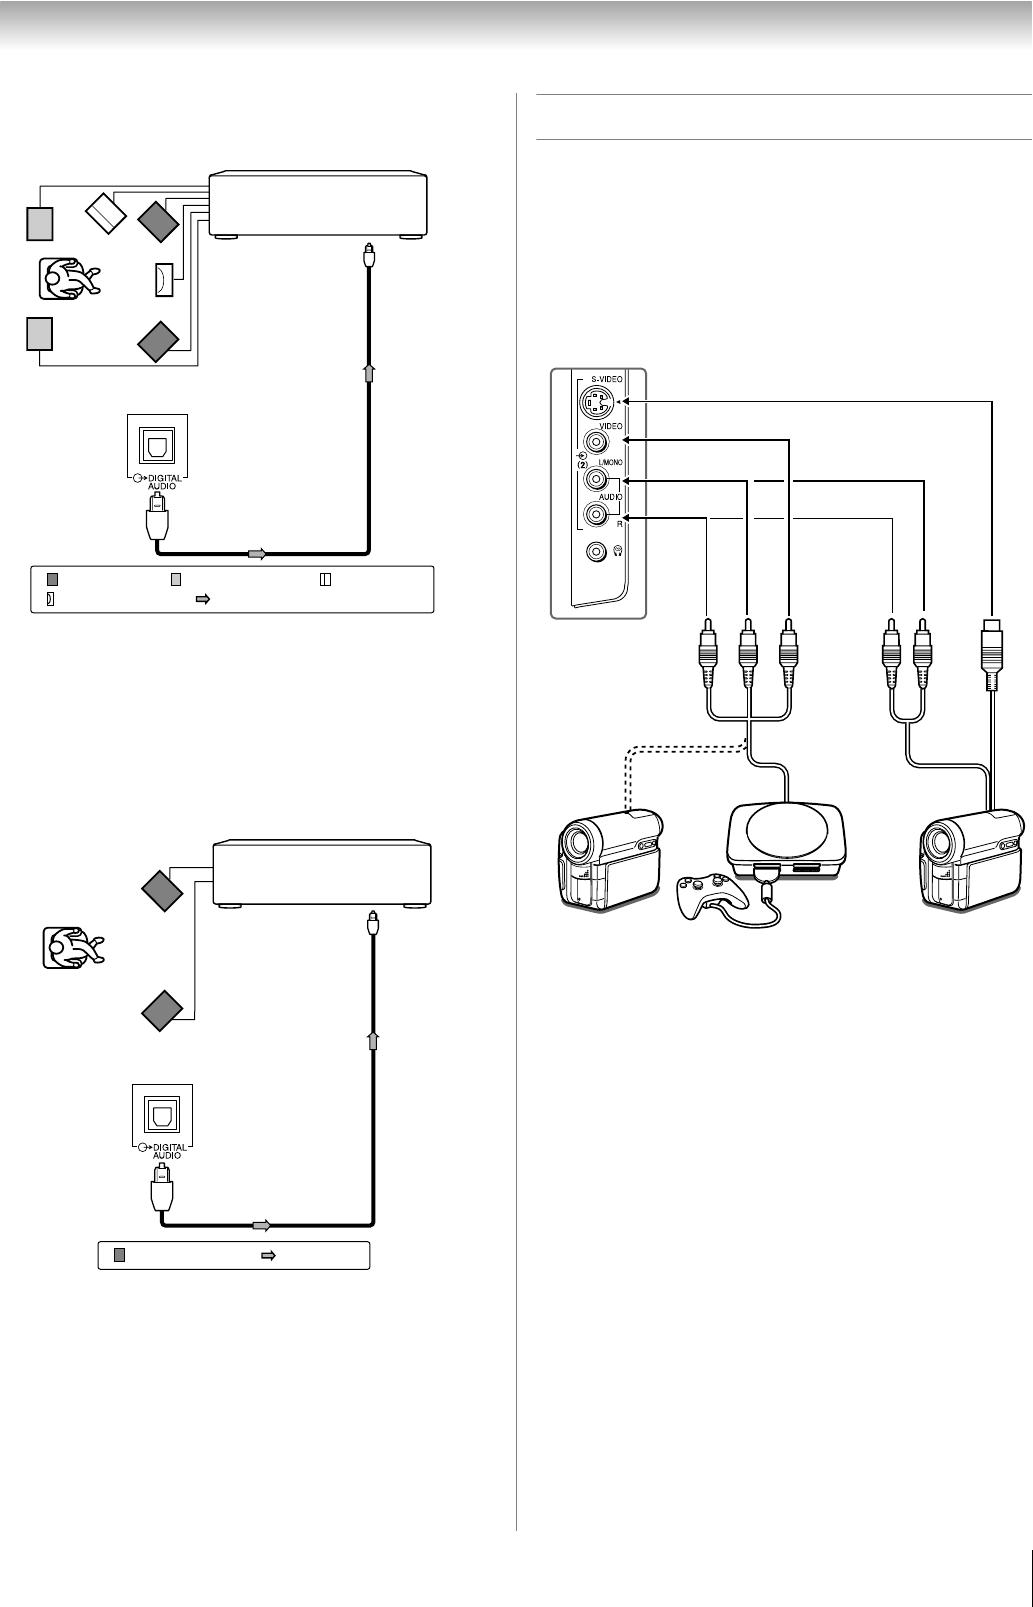 Toshiba 42Xv550A 560A Users Manual